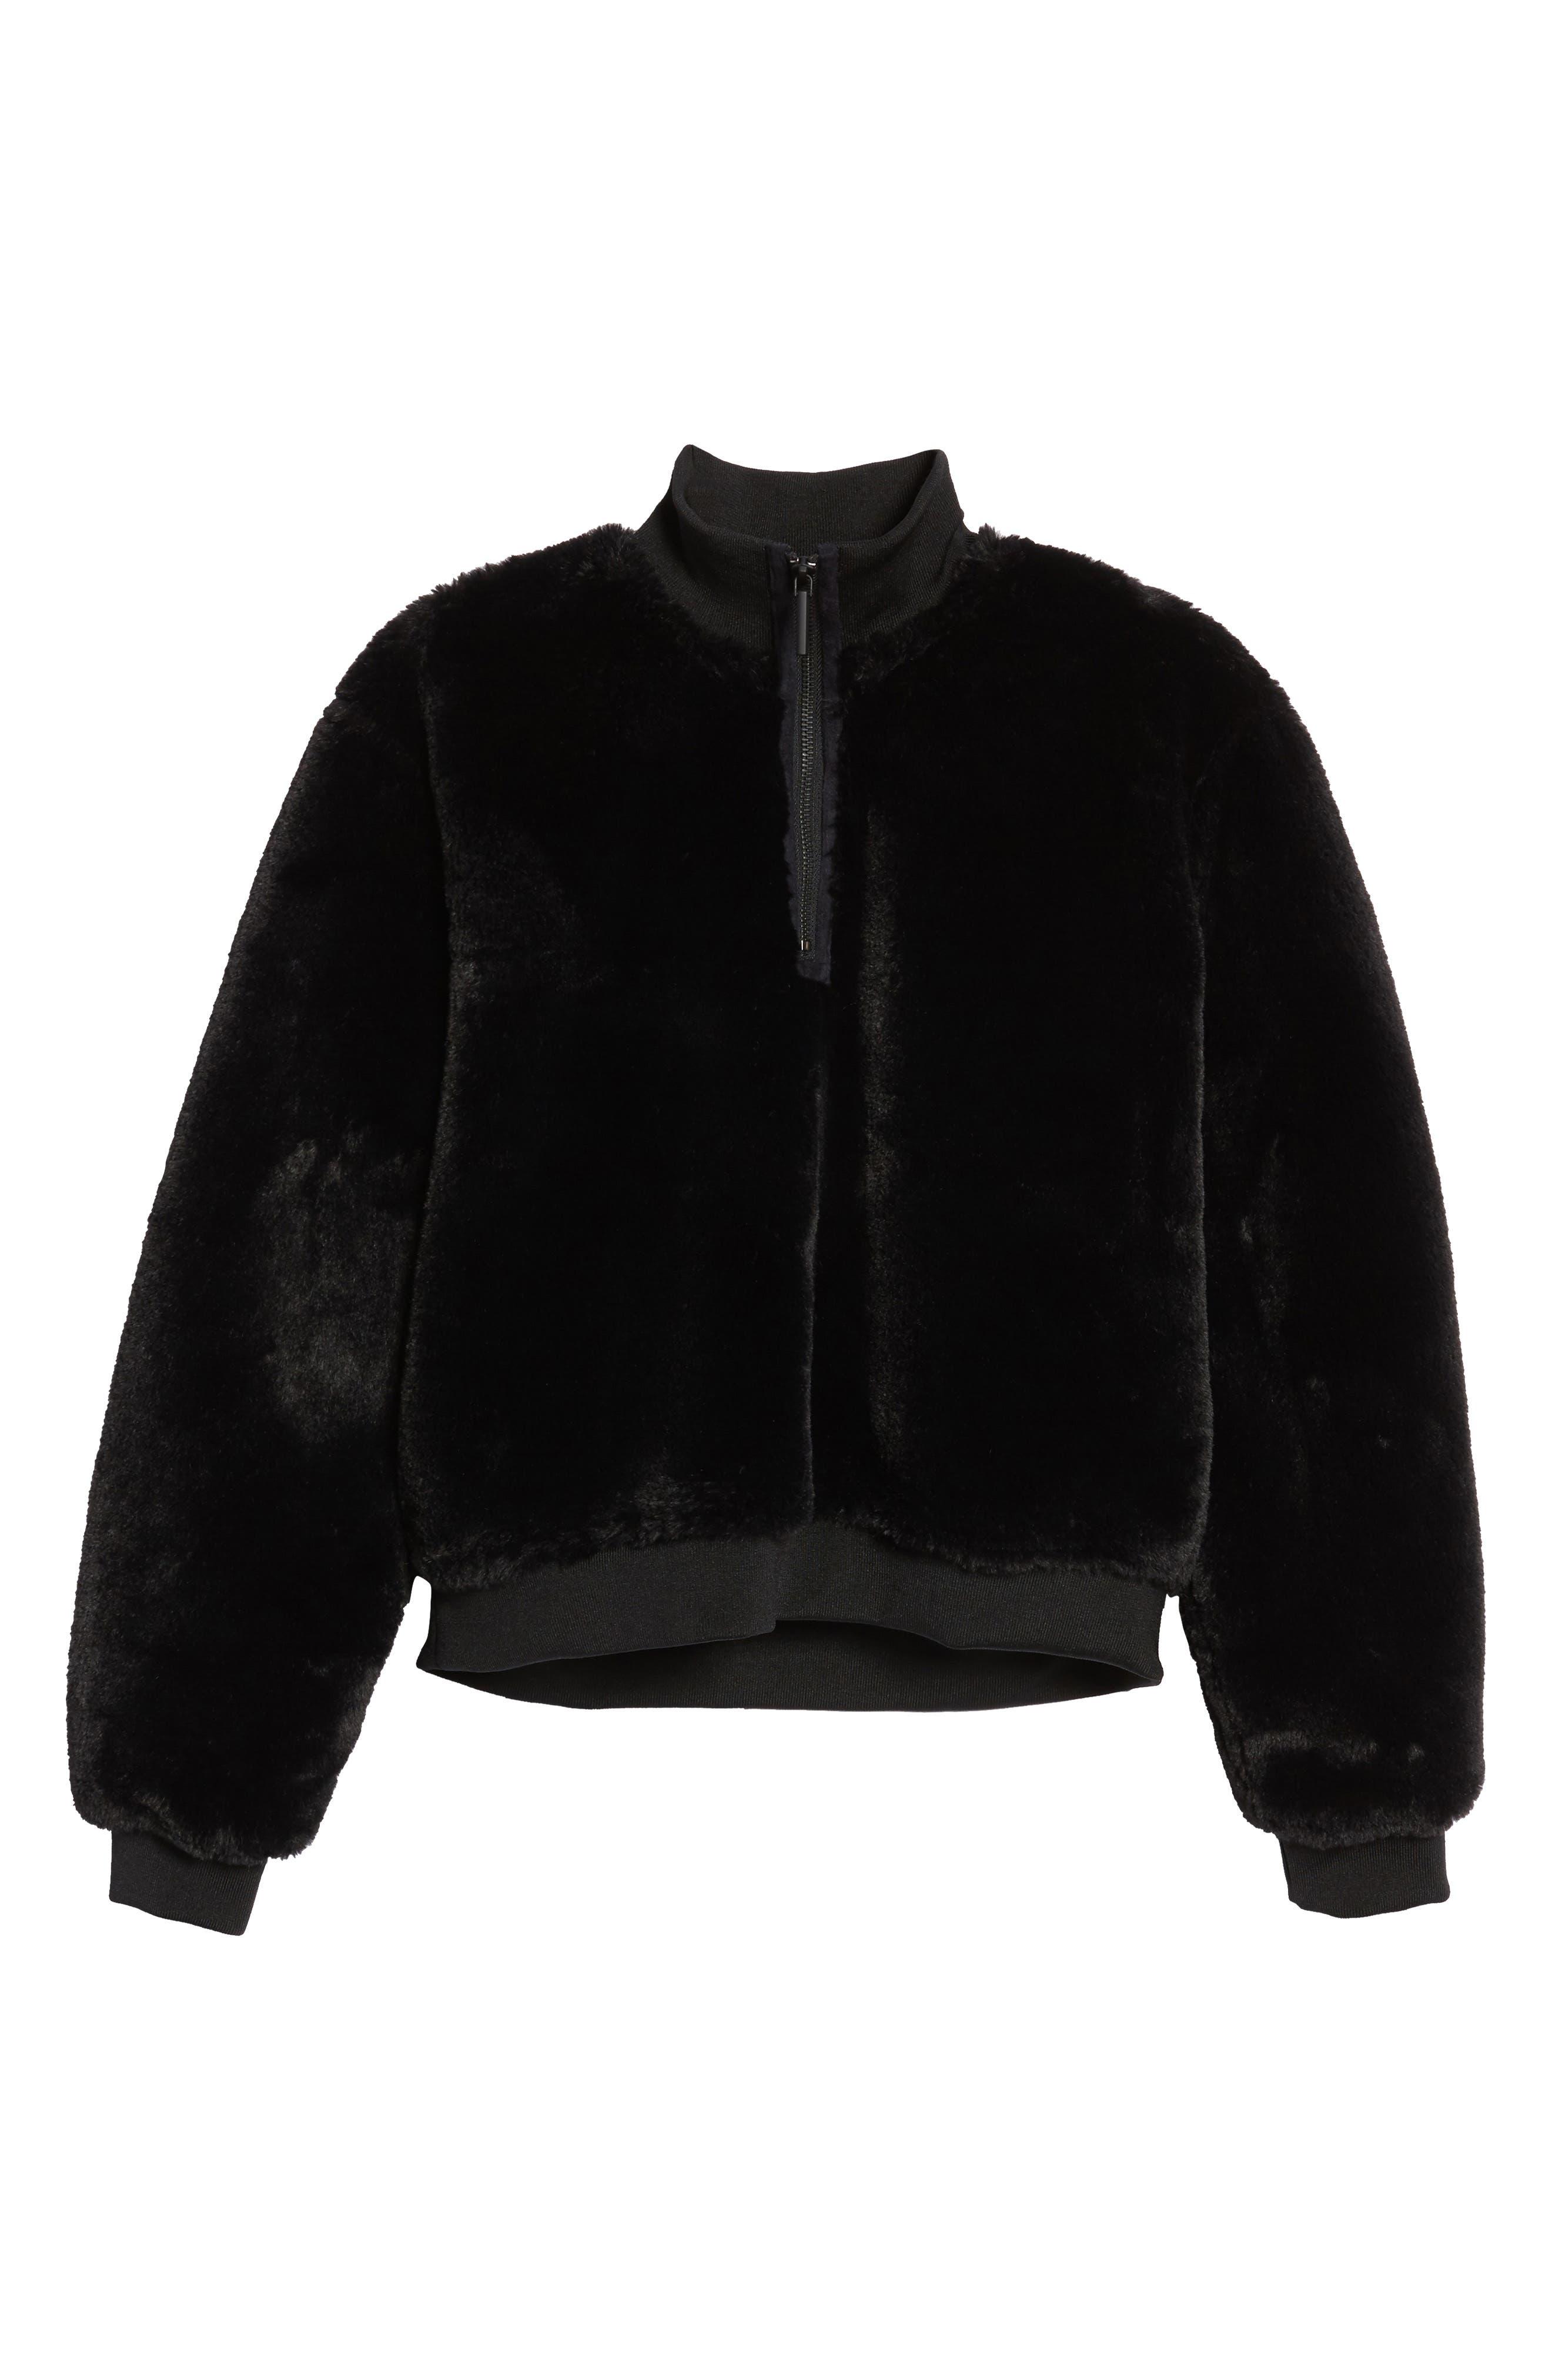 KENNETH COLE NEW YORK, Half-Zip Faux Fur Sweatshirt, Alternate thumbnail 6, color, BLACK